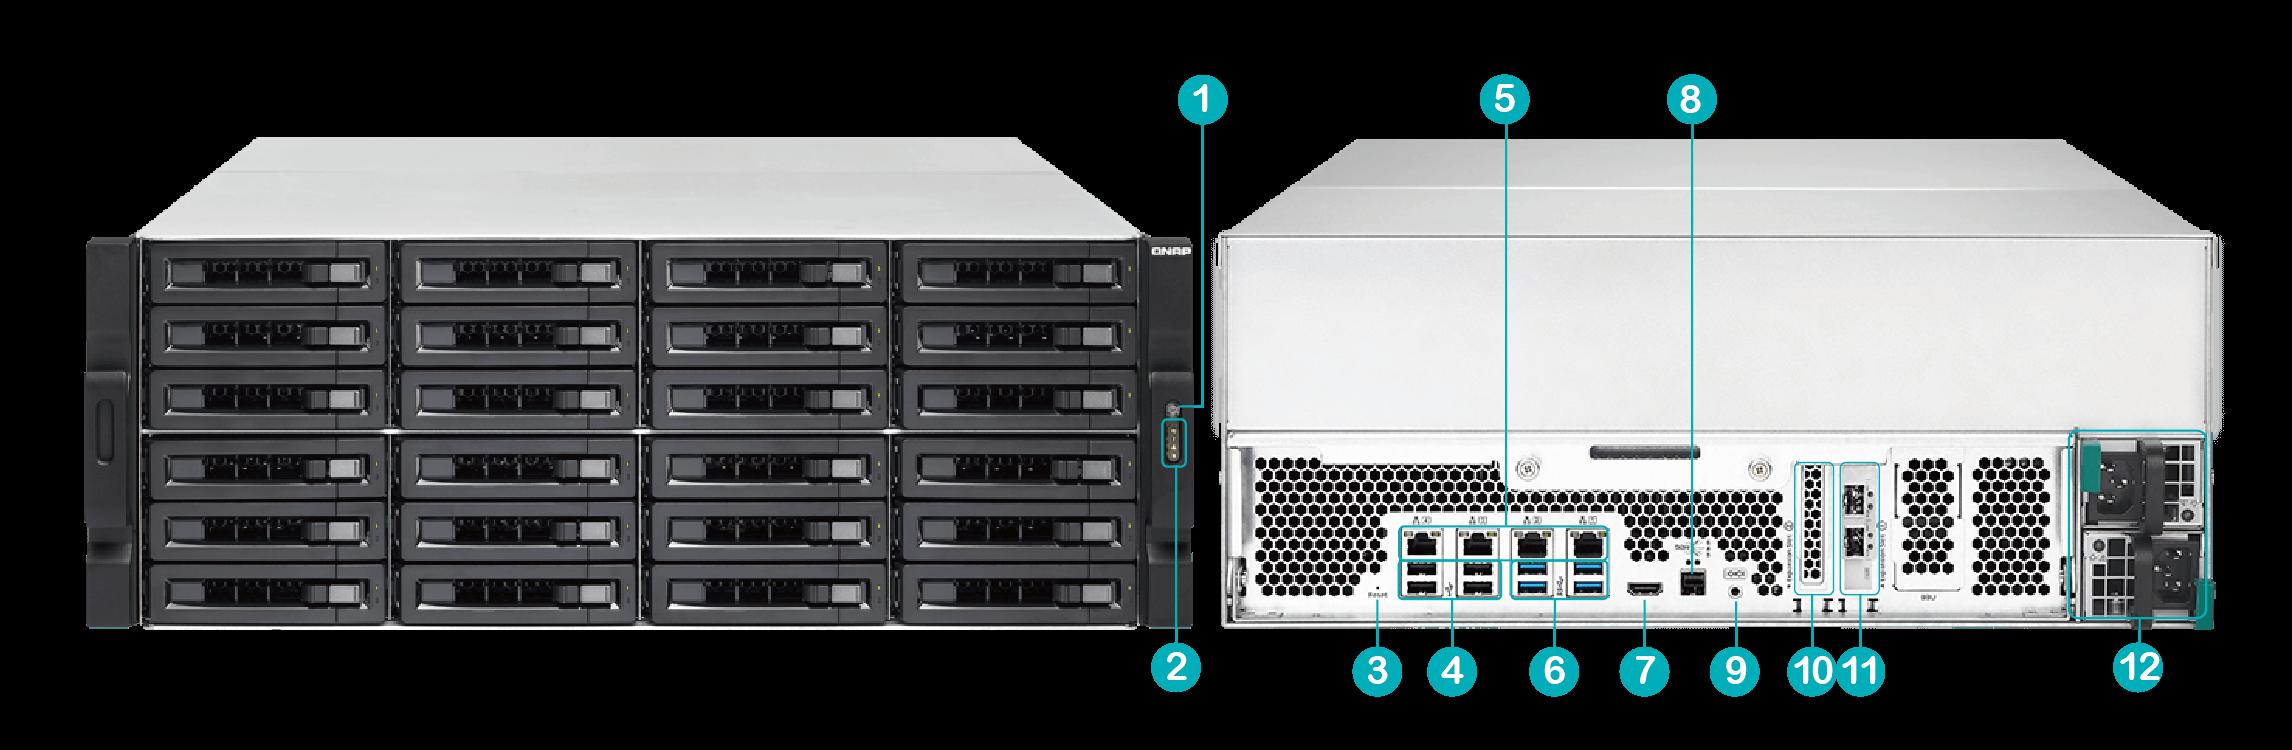 QNAP TVS-EC2480U-SAS-RP-16G-R2 24-Bay Rackmount NAS Diskless – SimplyNAS